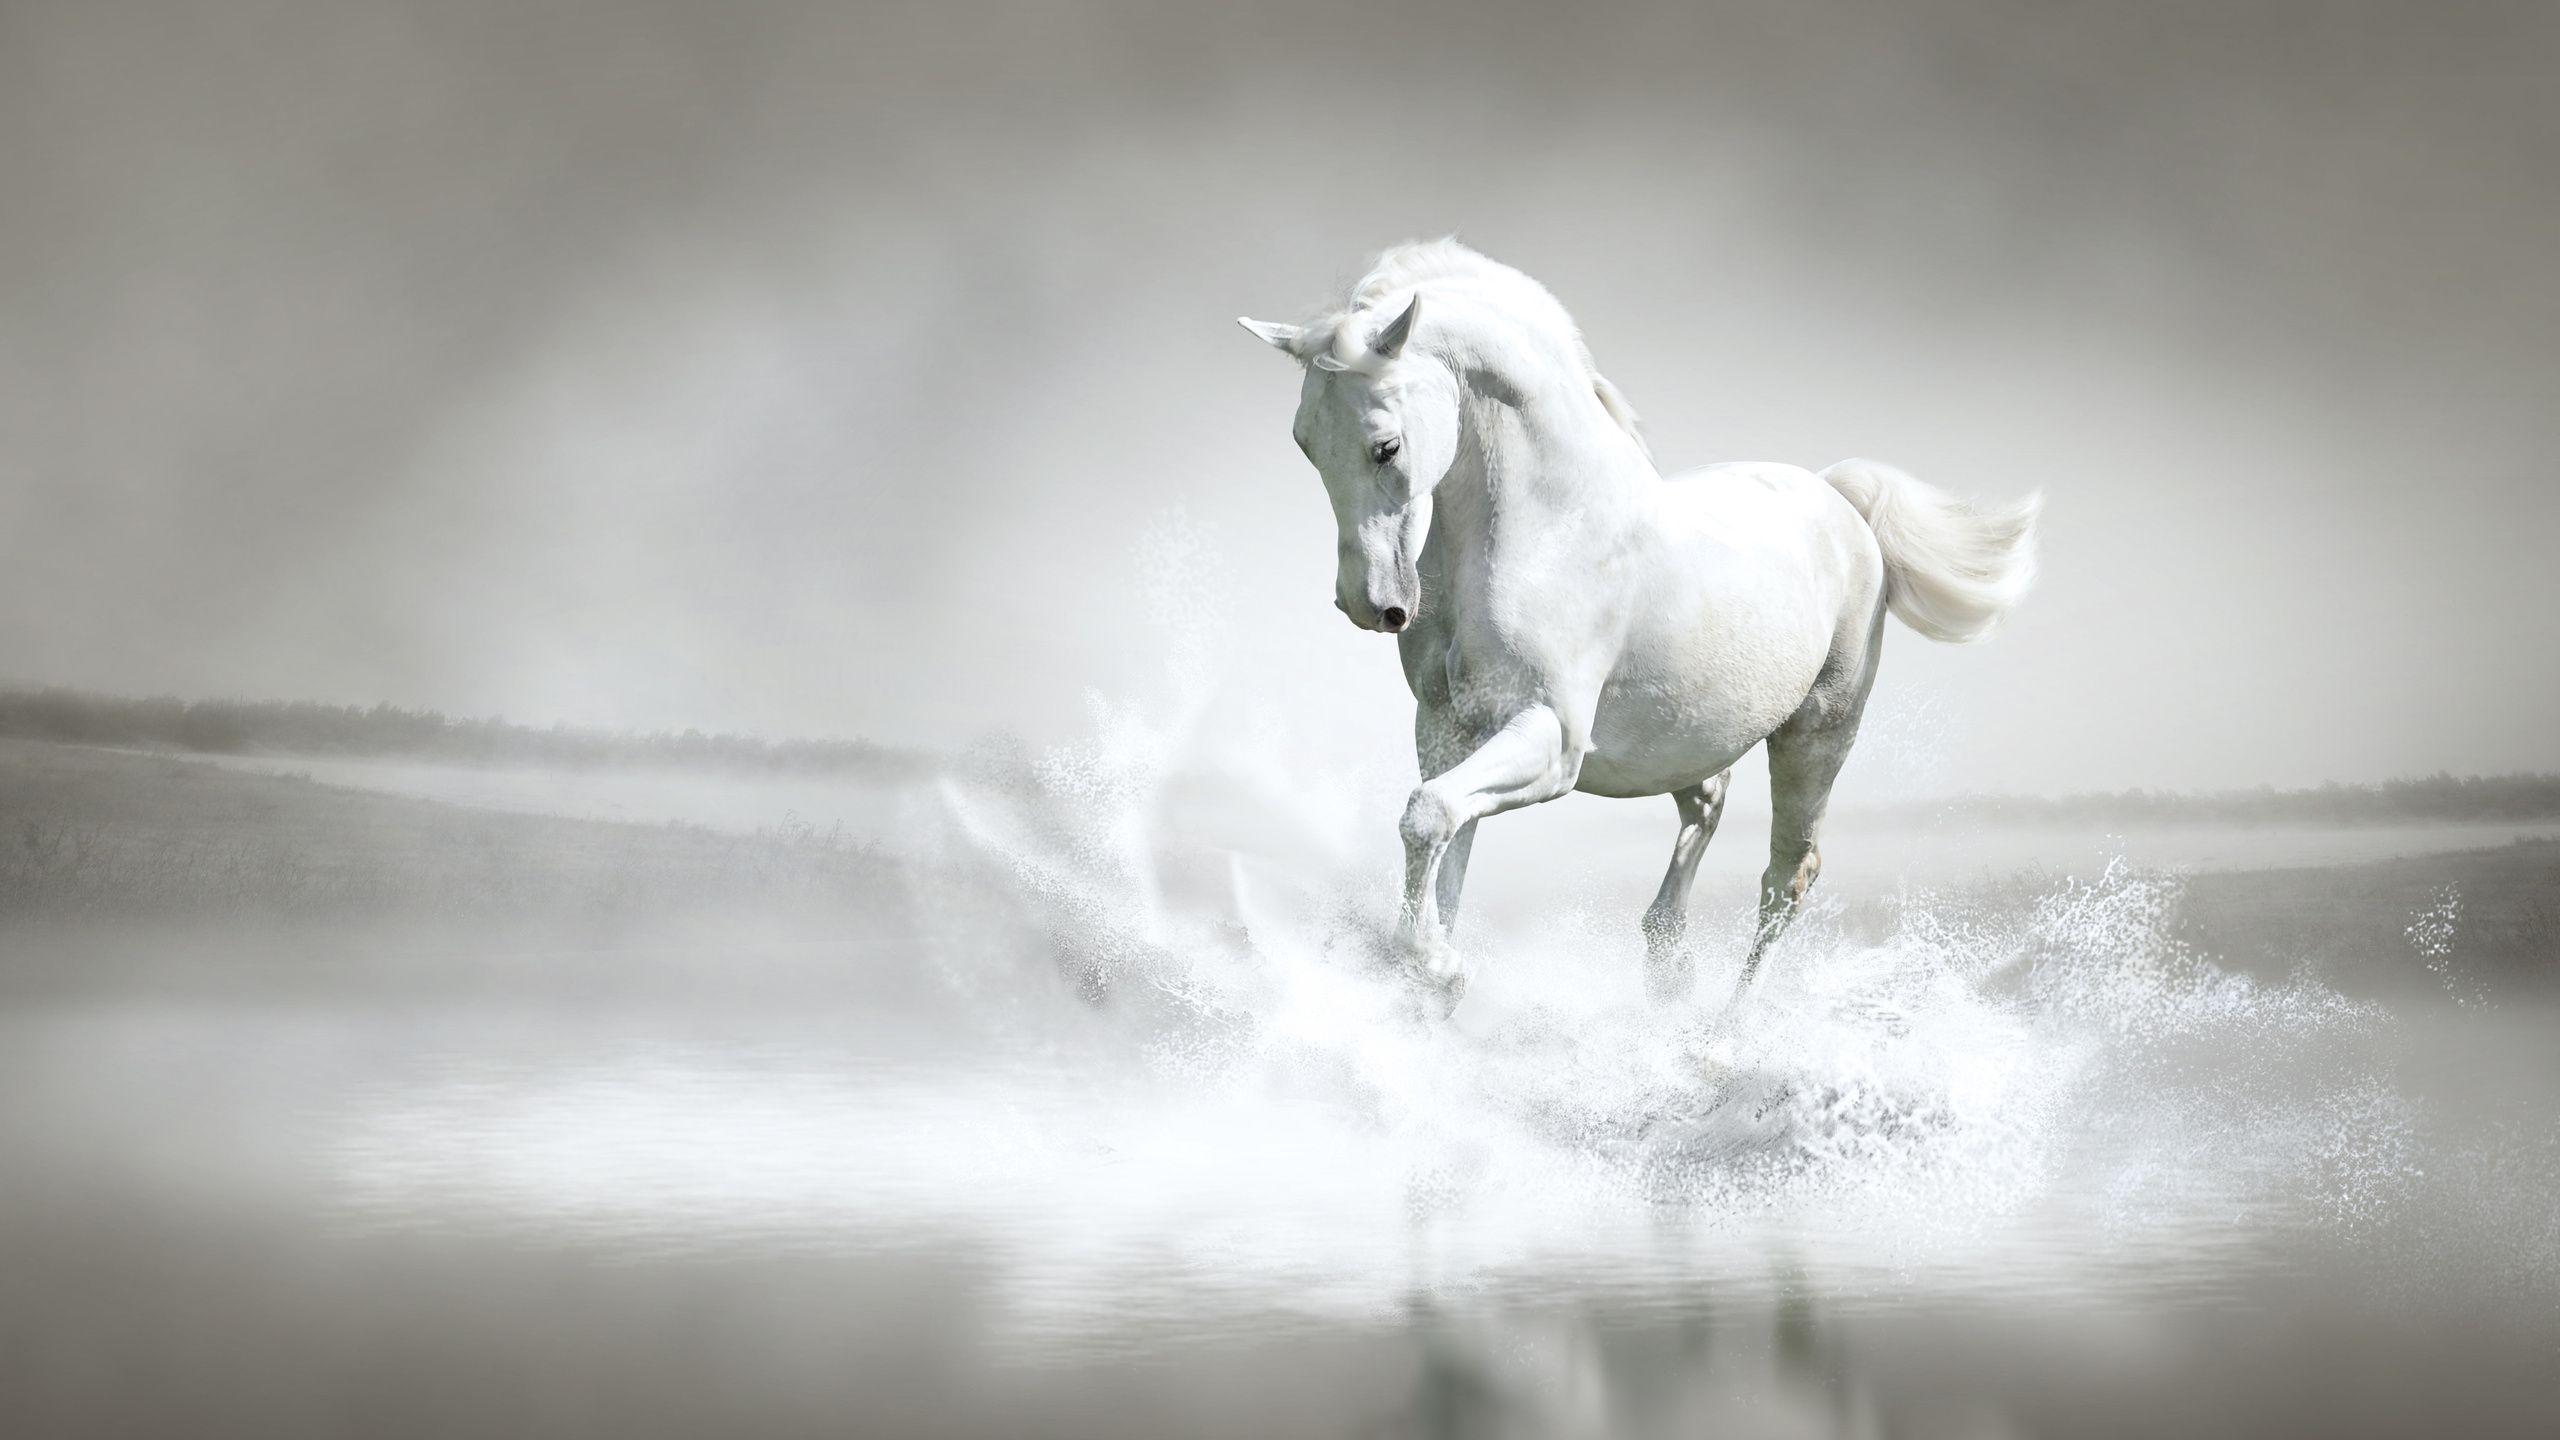 Cool Wallpaper Horse Water - cb47b6a30ecc47a13a96fa7b626c4959  Best Photo Reference_279434.jpg